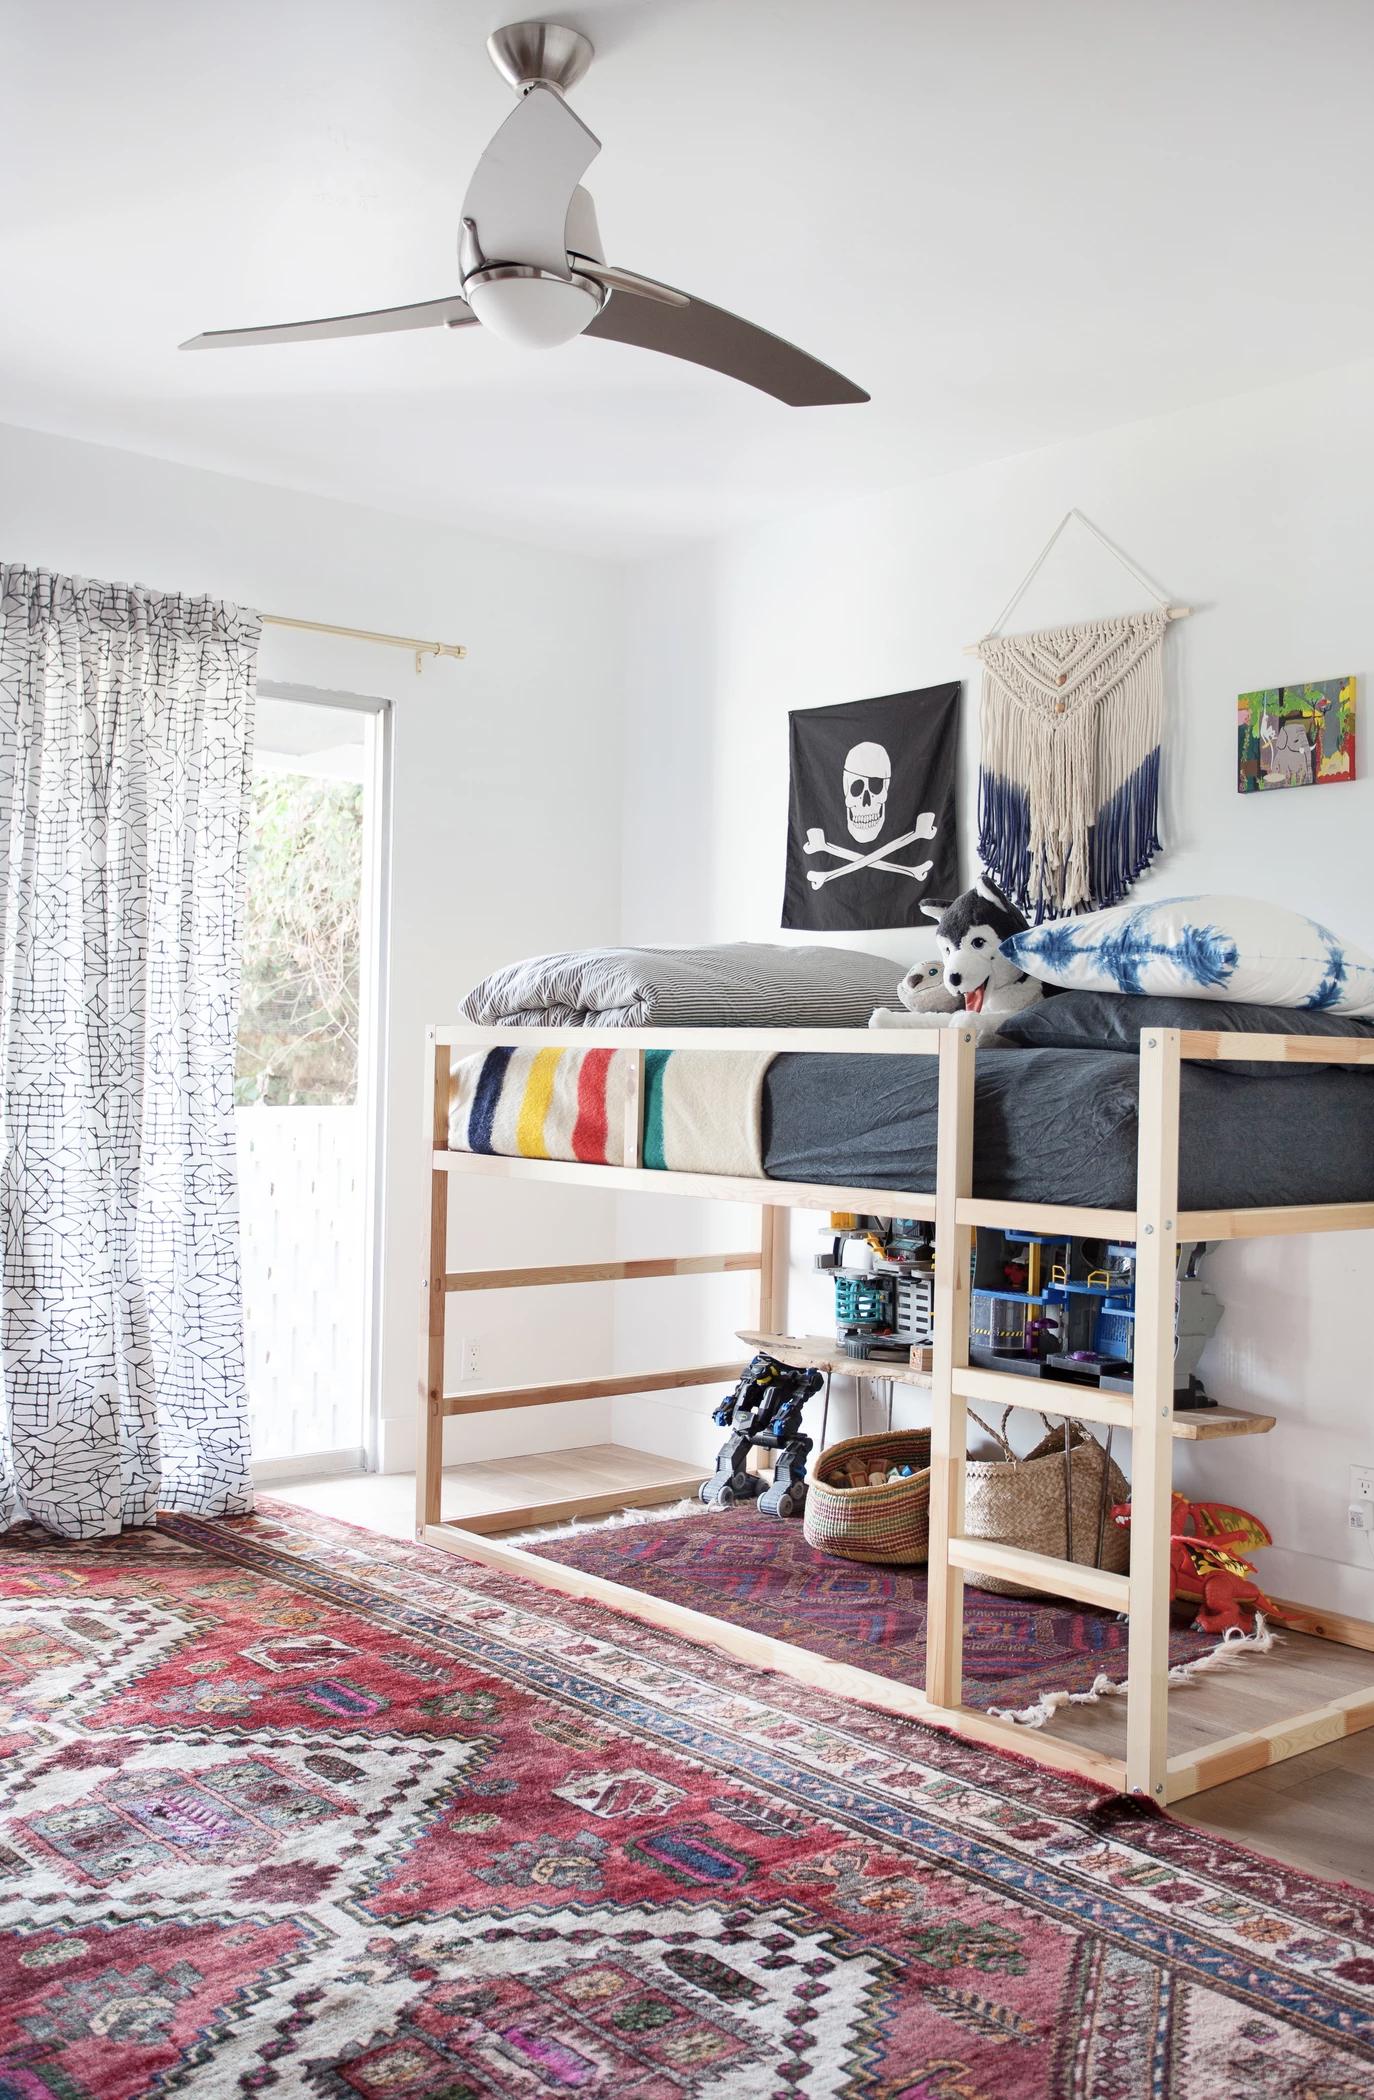 30 genius toy storage ideas for your kid s room diy kids bedroom rh housebeautiful com